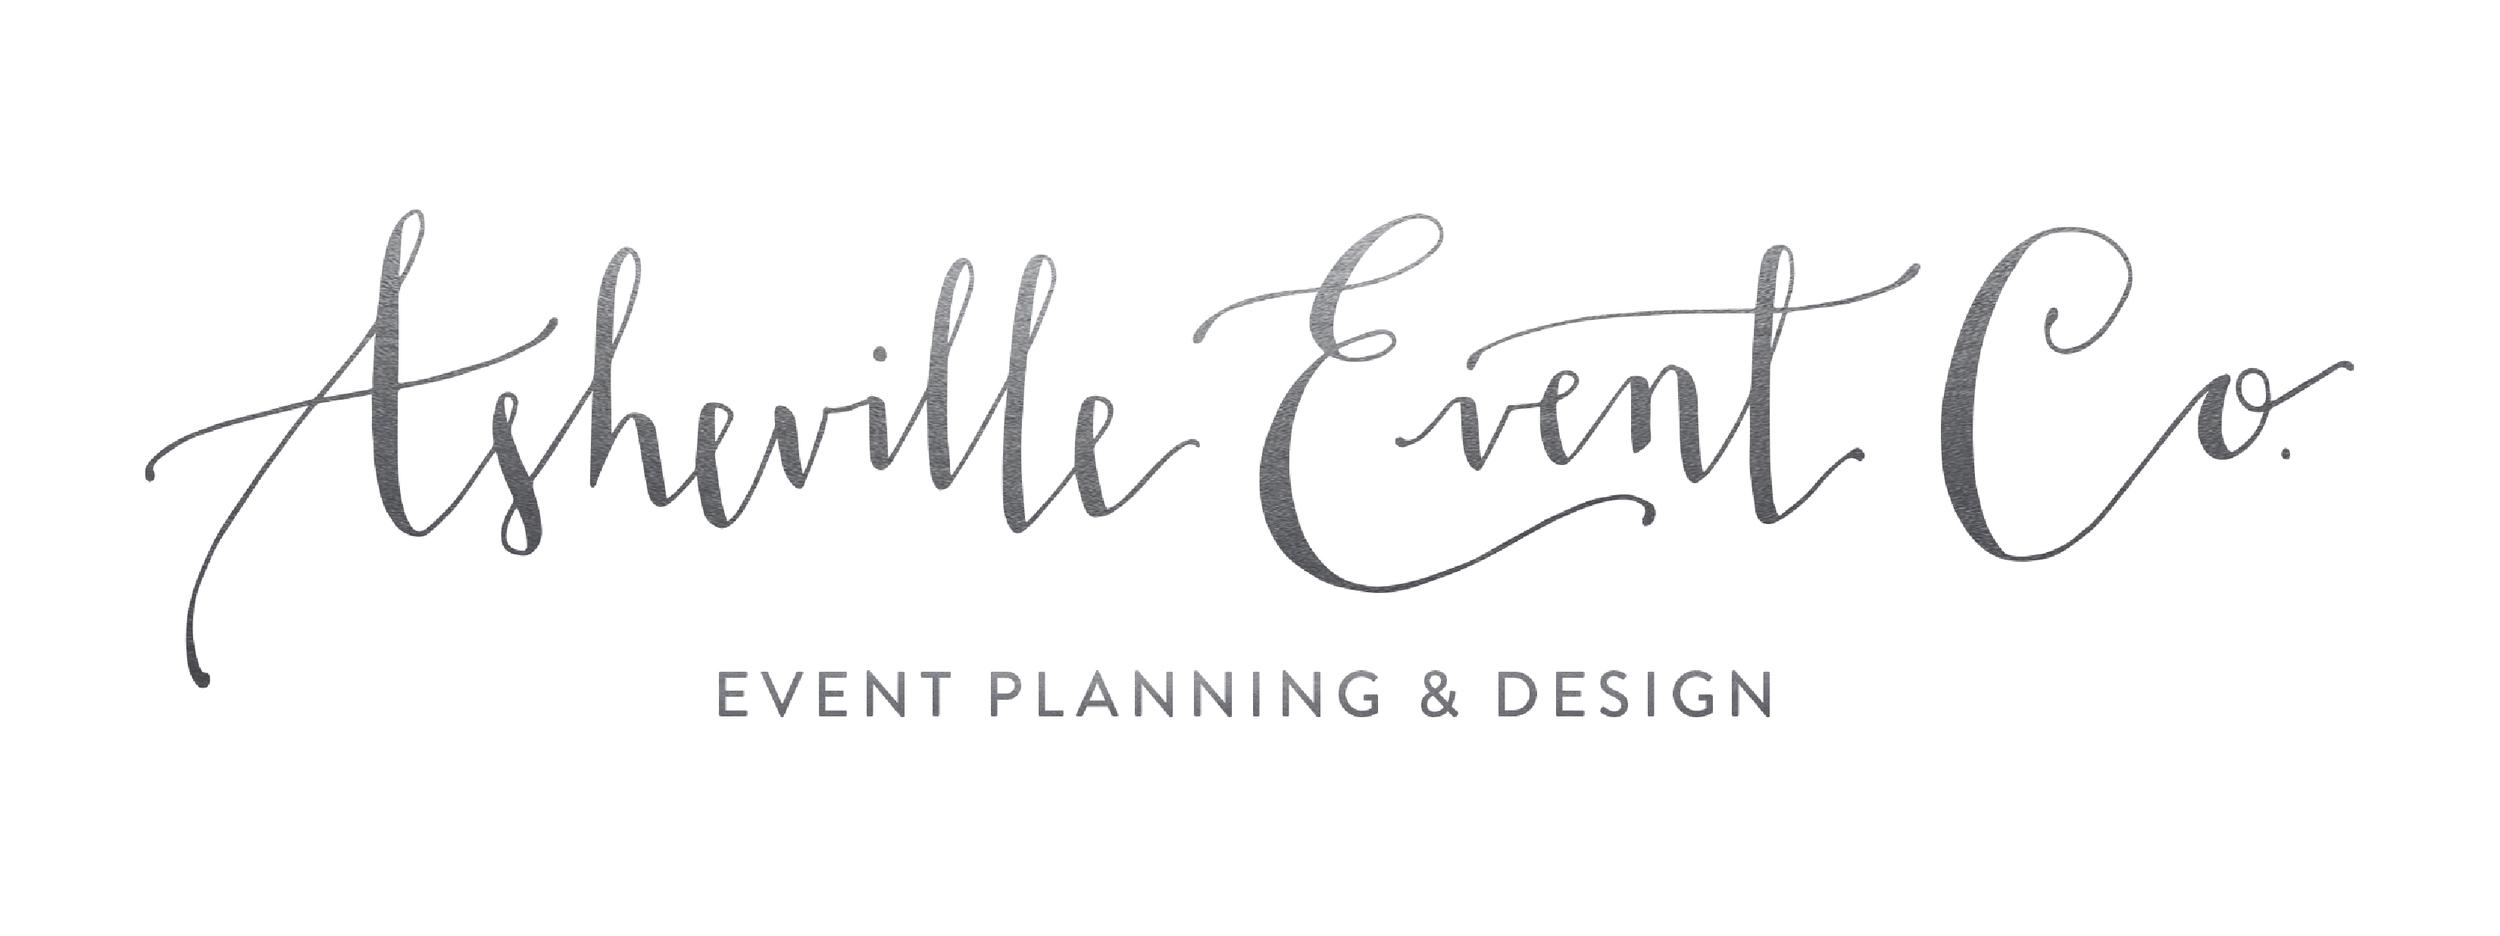 Sable and Gray - Asheville Event Co. Logo Design 2